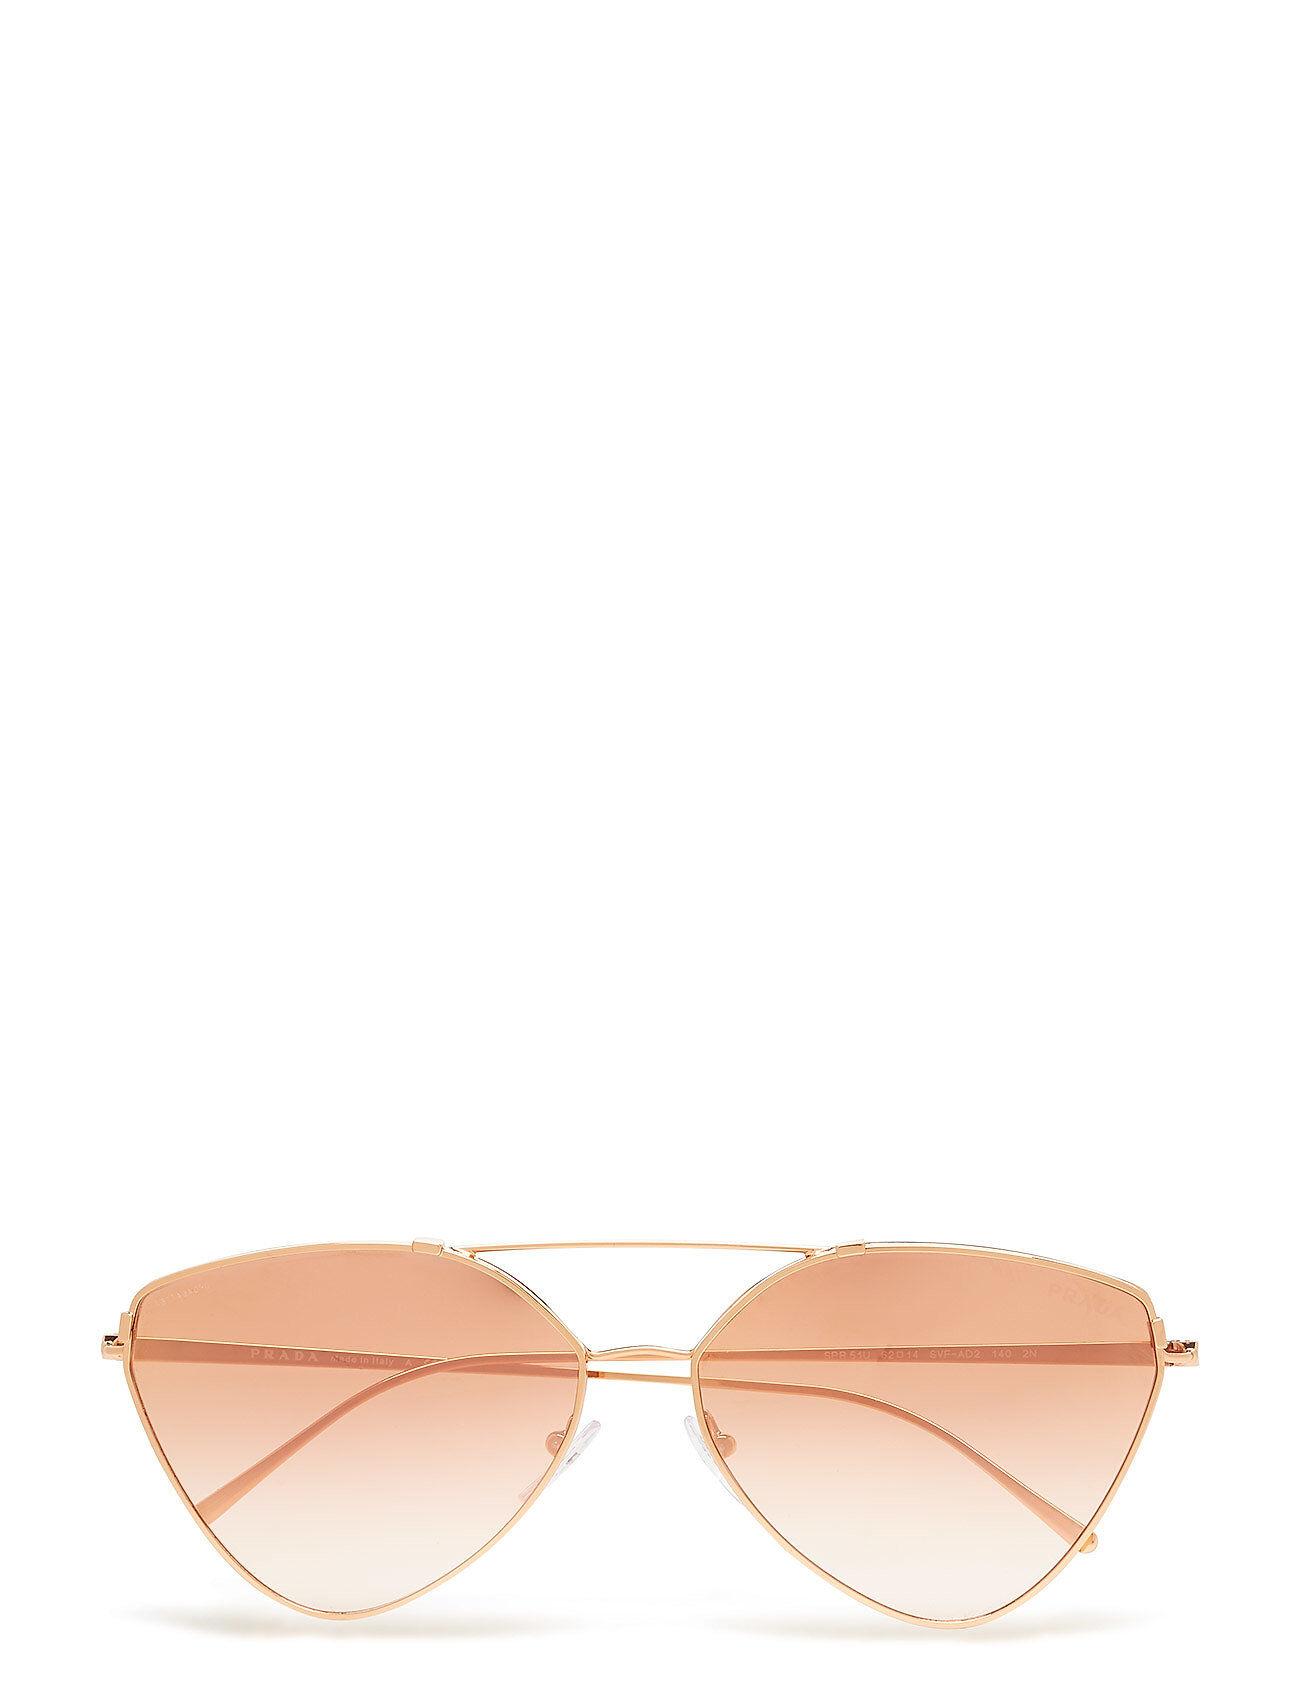 Image of Prada Sunglasses Women'S Sunglasses Neliönmuotoiset Aurinkolasit Kulta